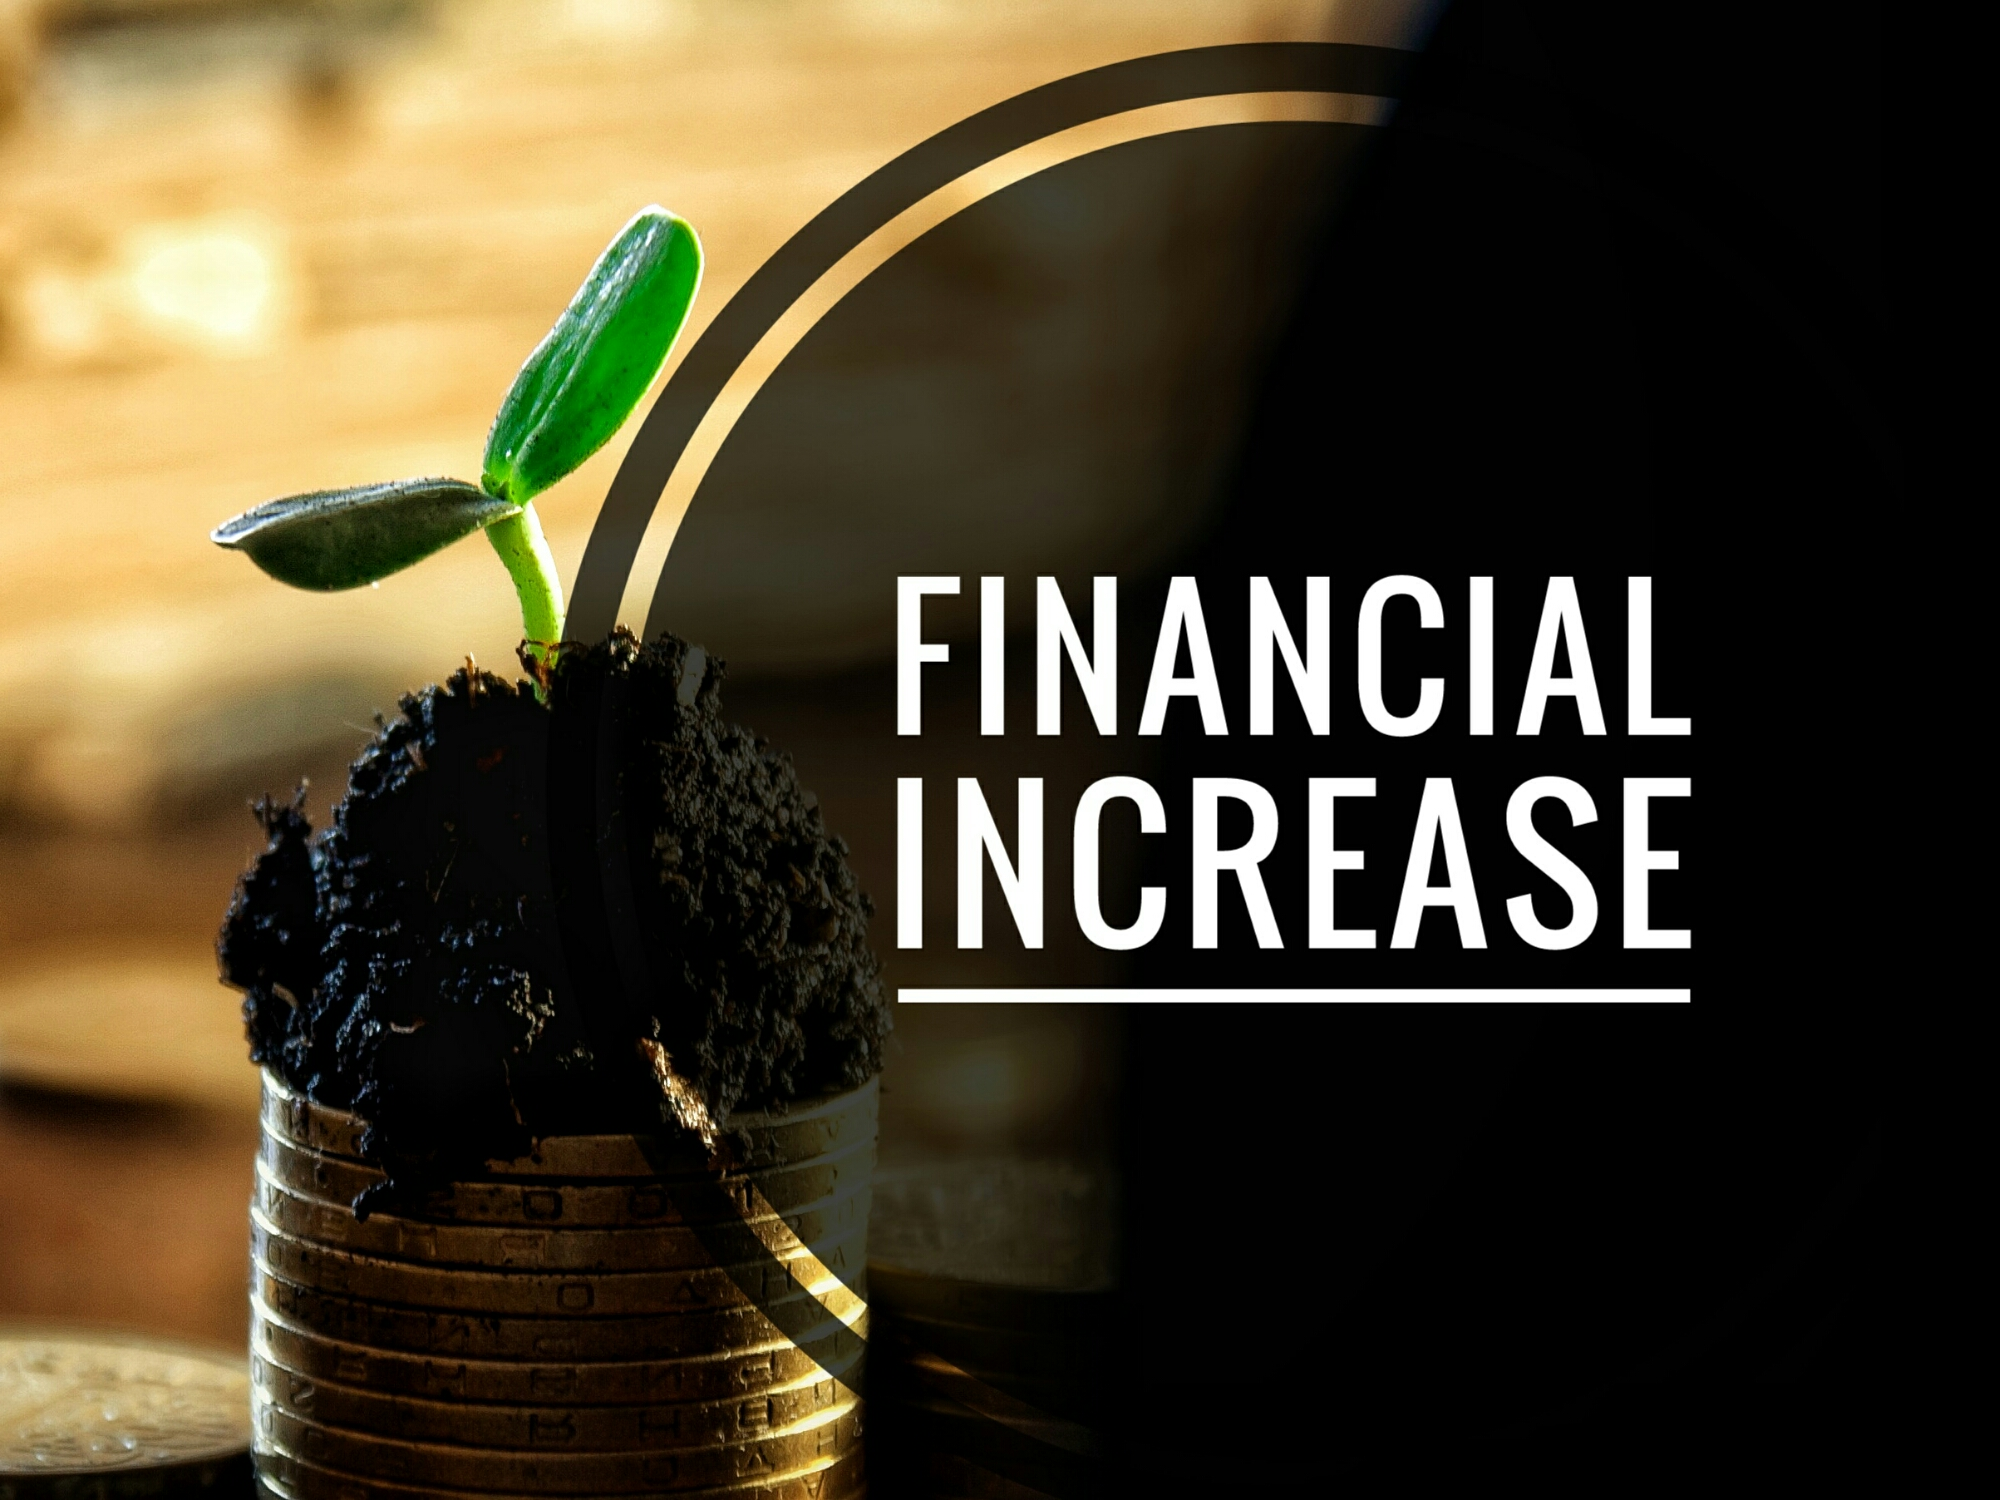 Financial Increase